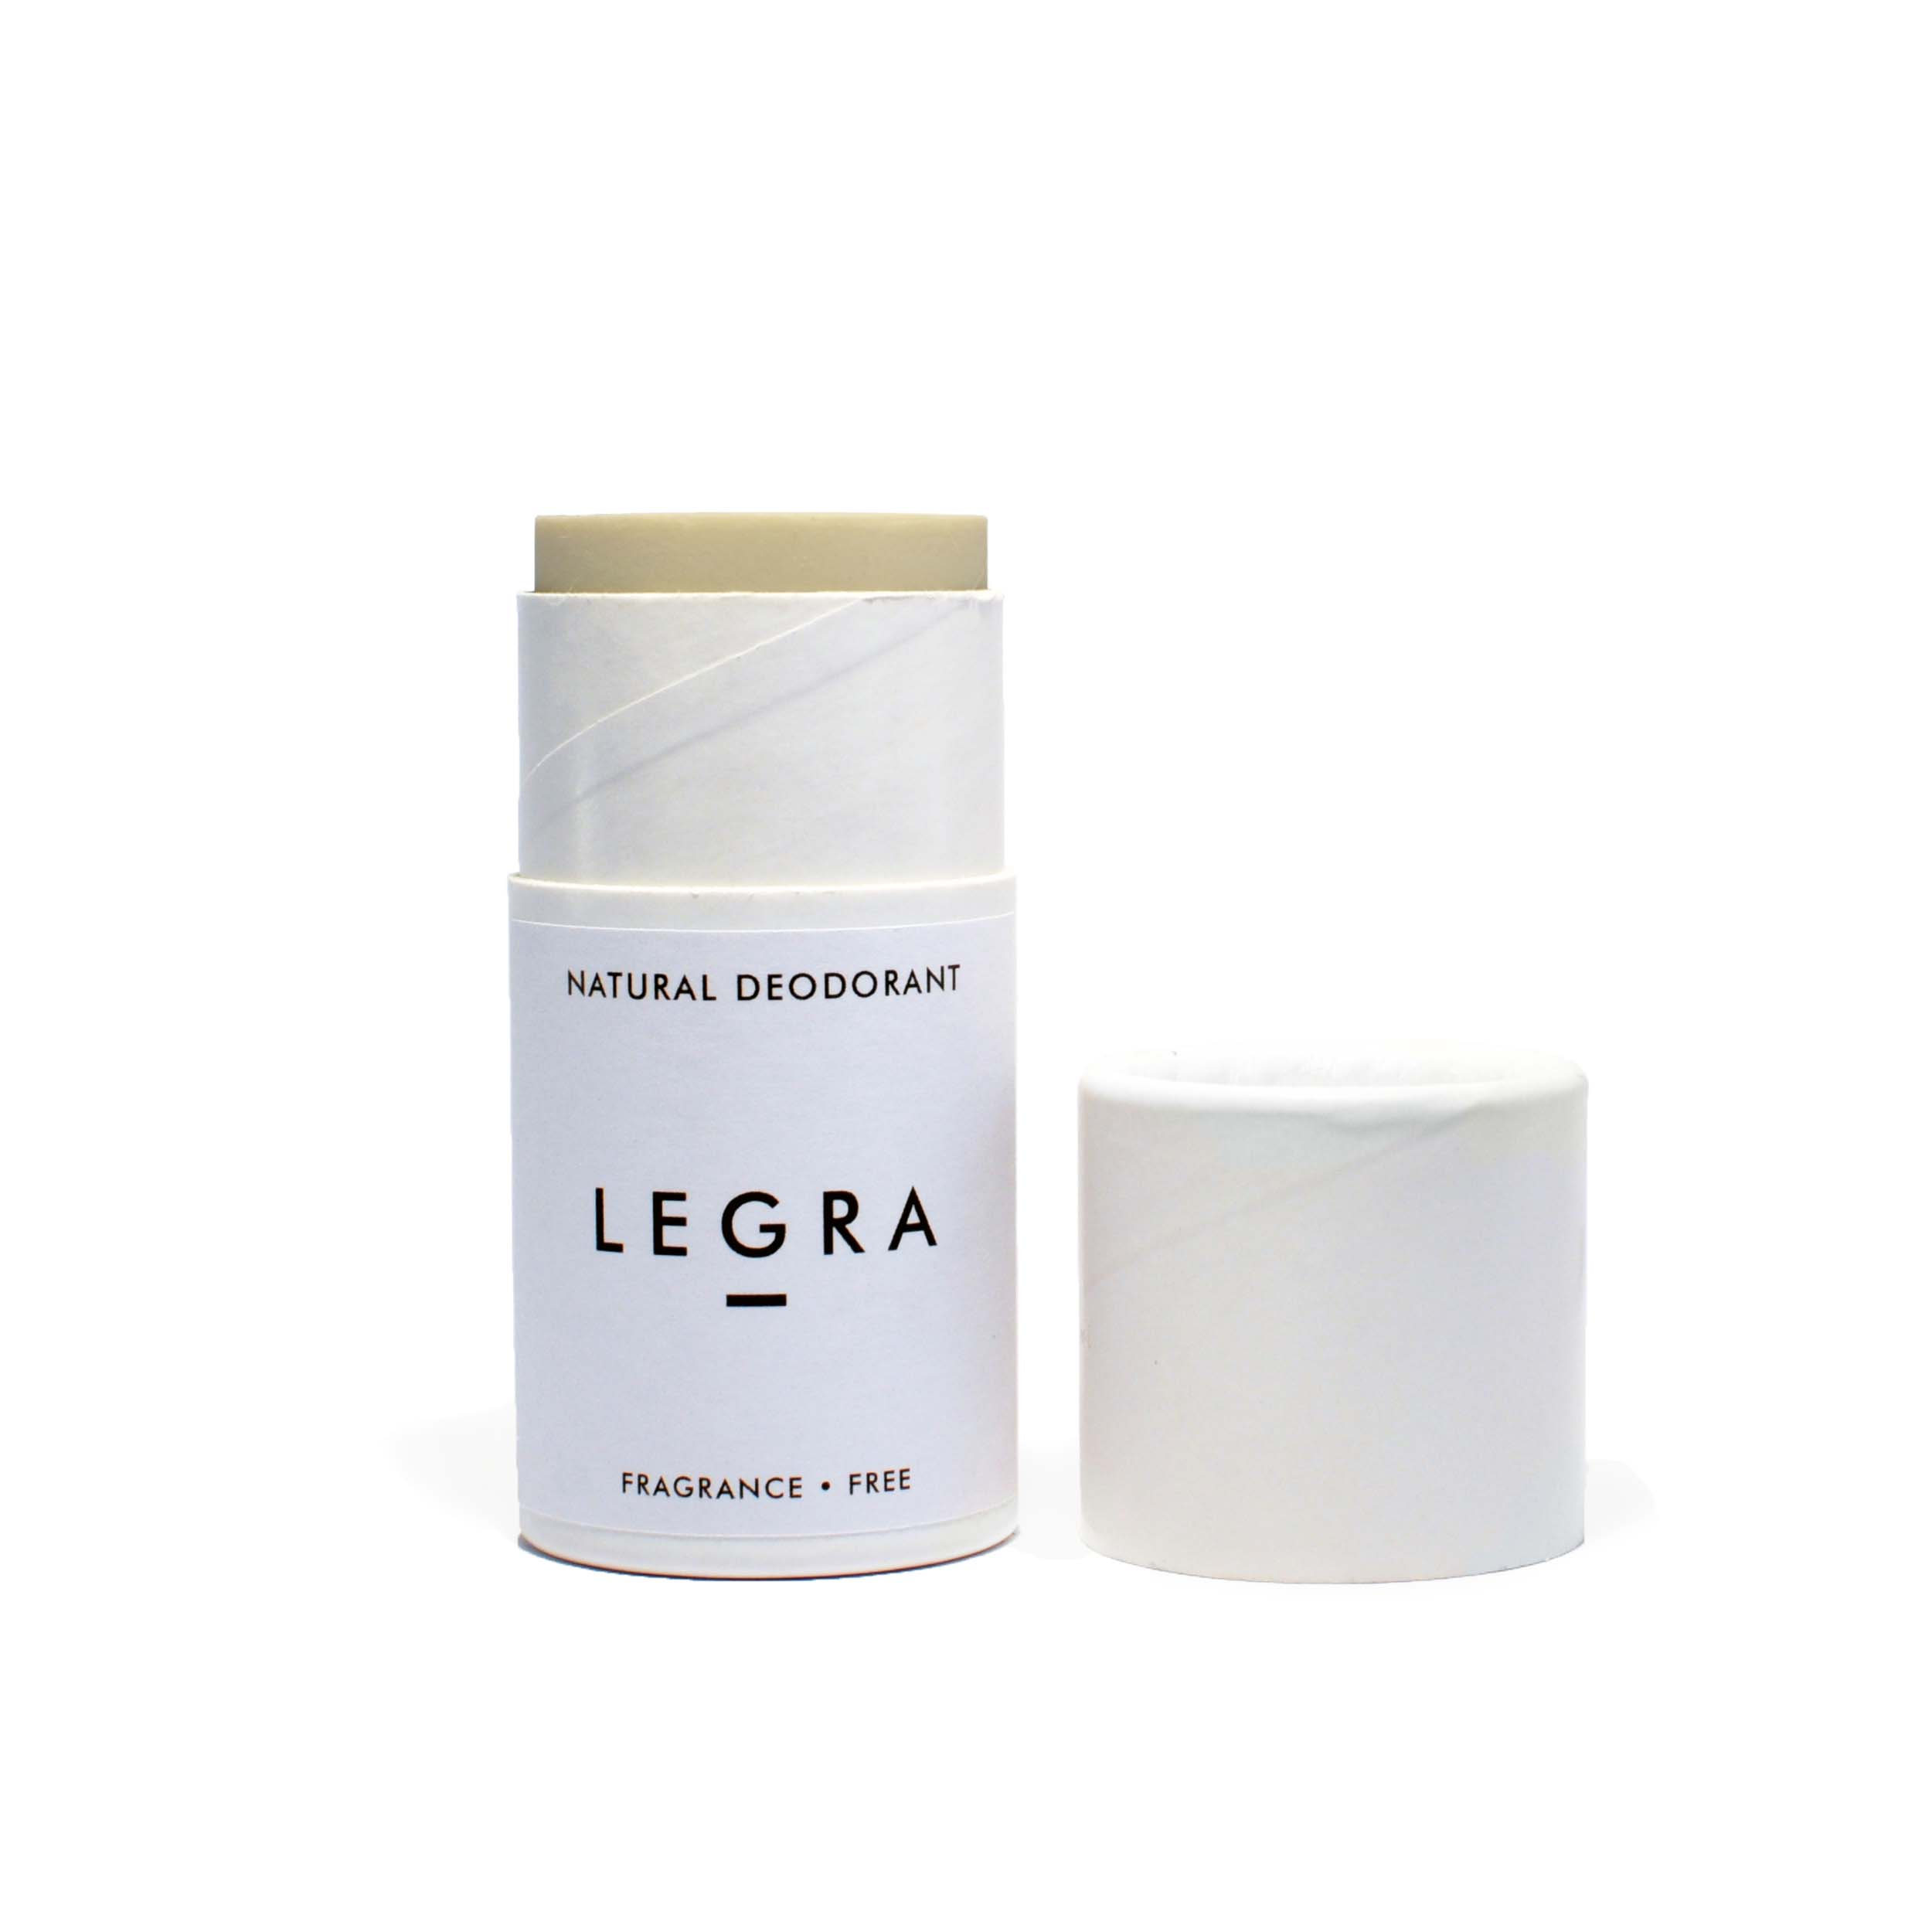 Natural Deodorant Stick. Fragrance Free